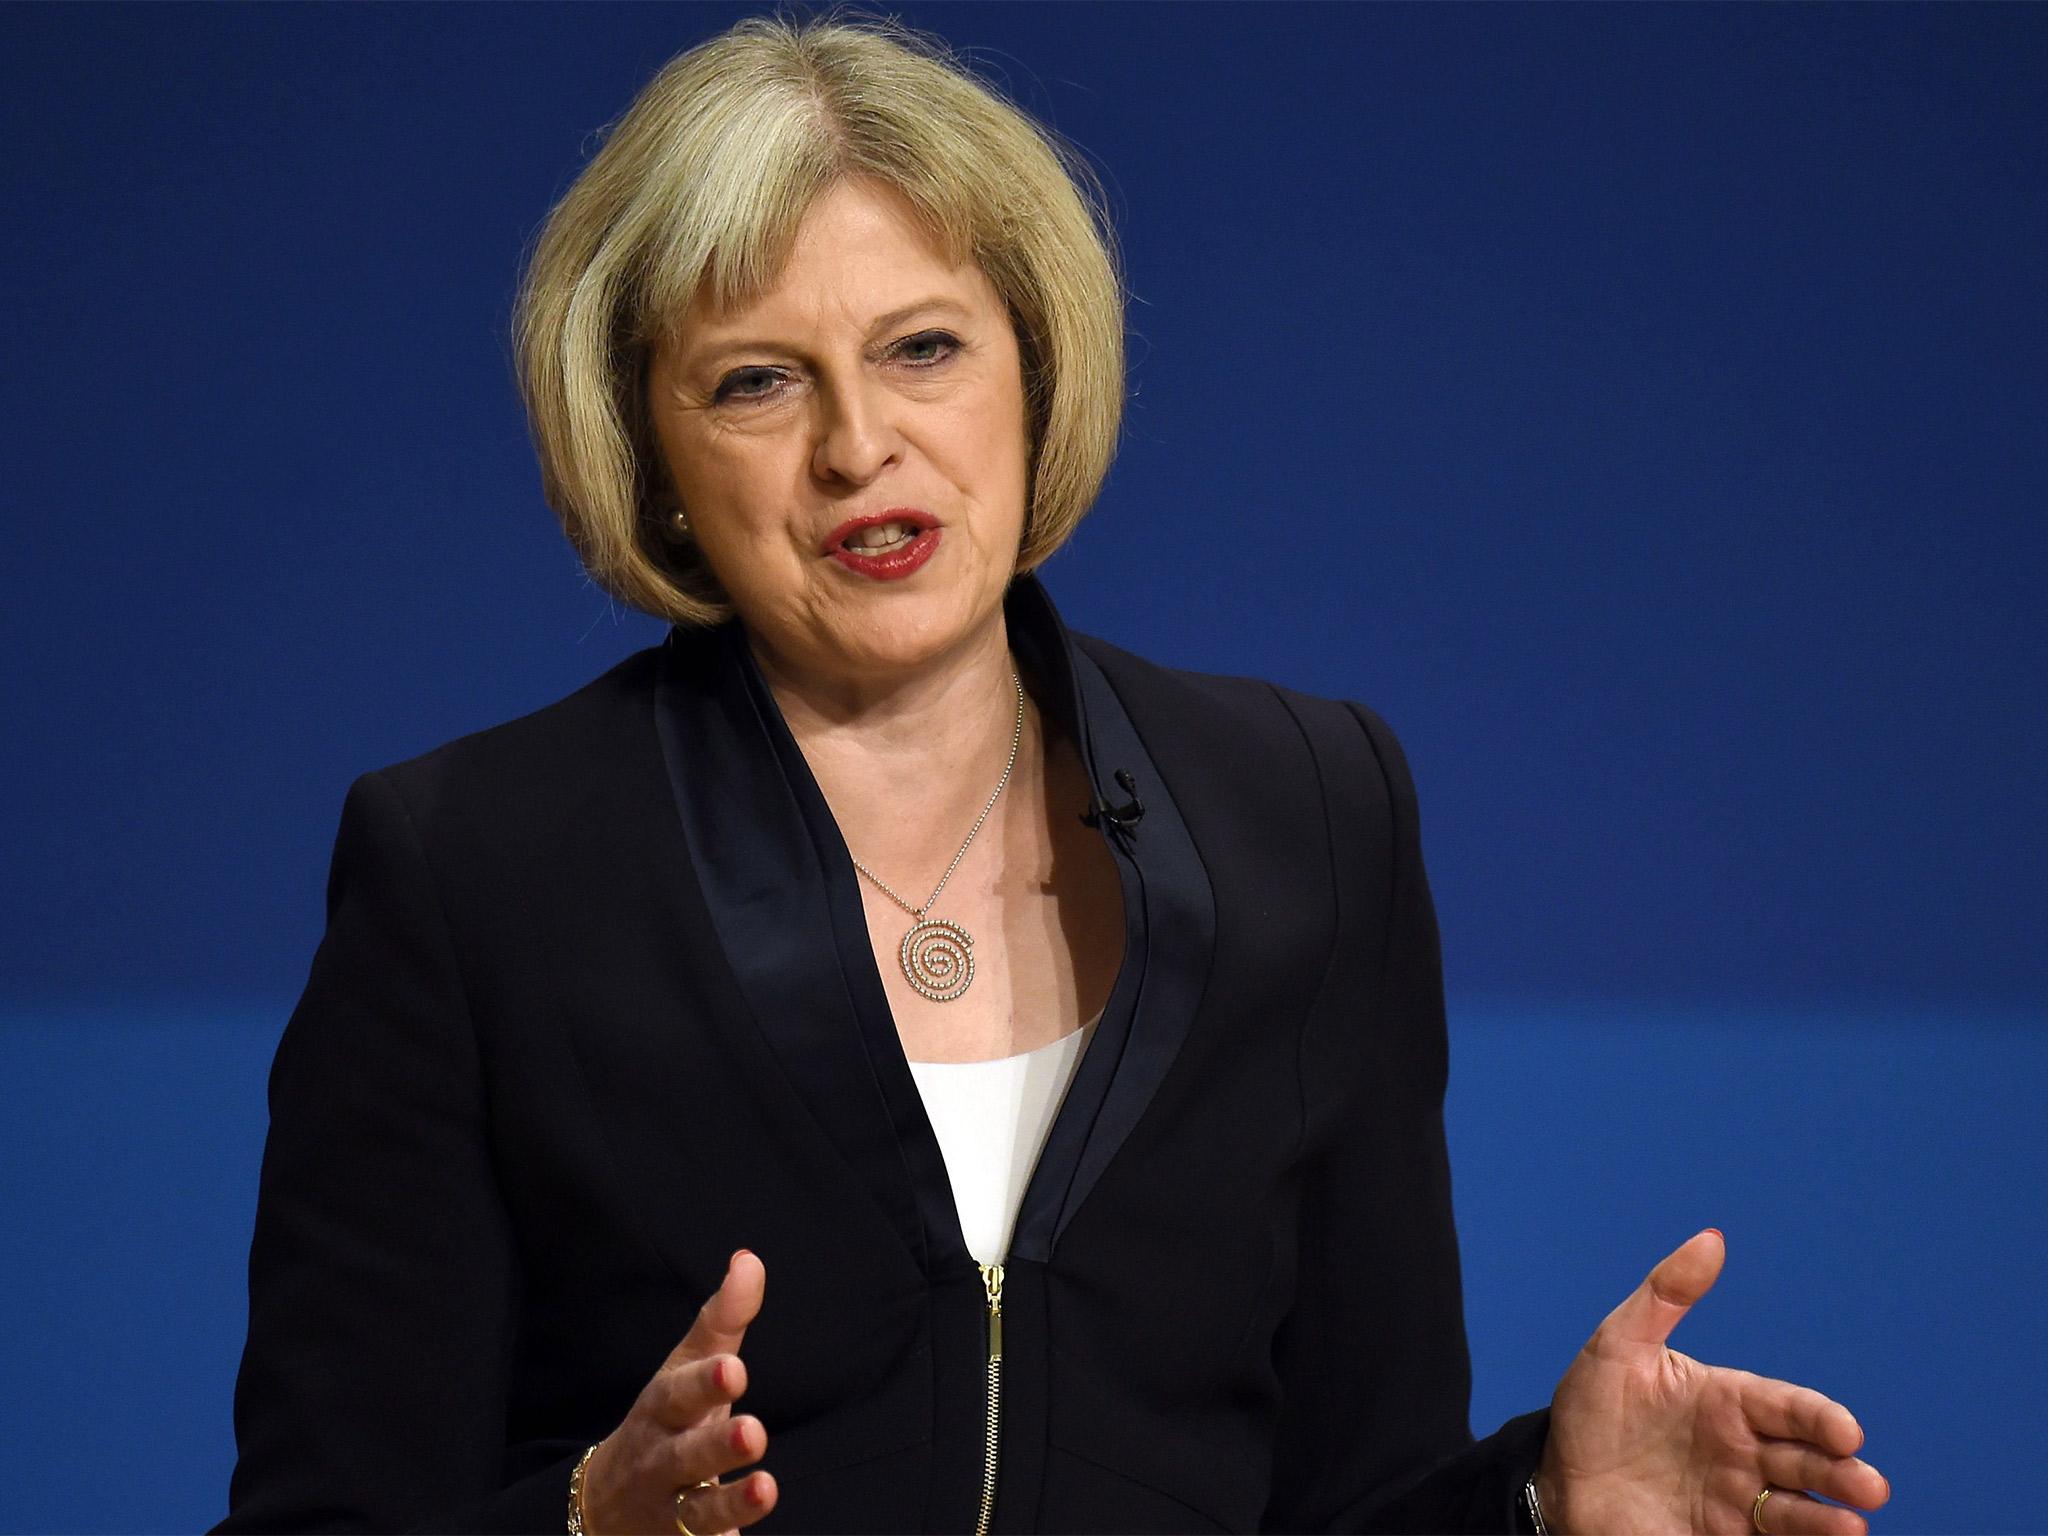 David Cameron, European Union, India-UK partnership, India-UK Tech Summit, External Affairs Ministry, India-UK strategic partnership, Narendra Modi, Theresa May, bilateral visit,